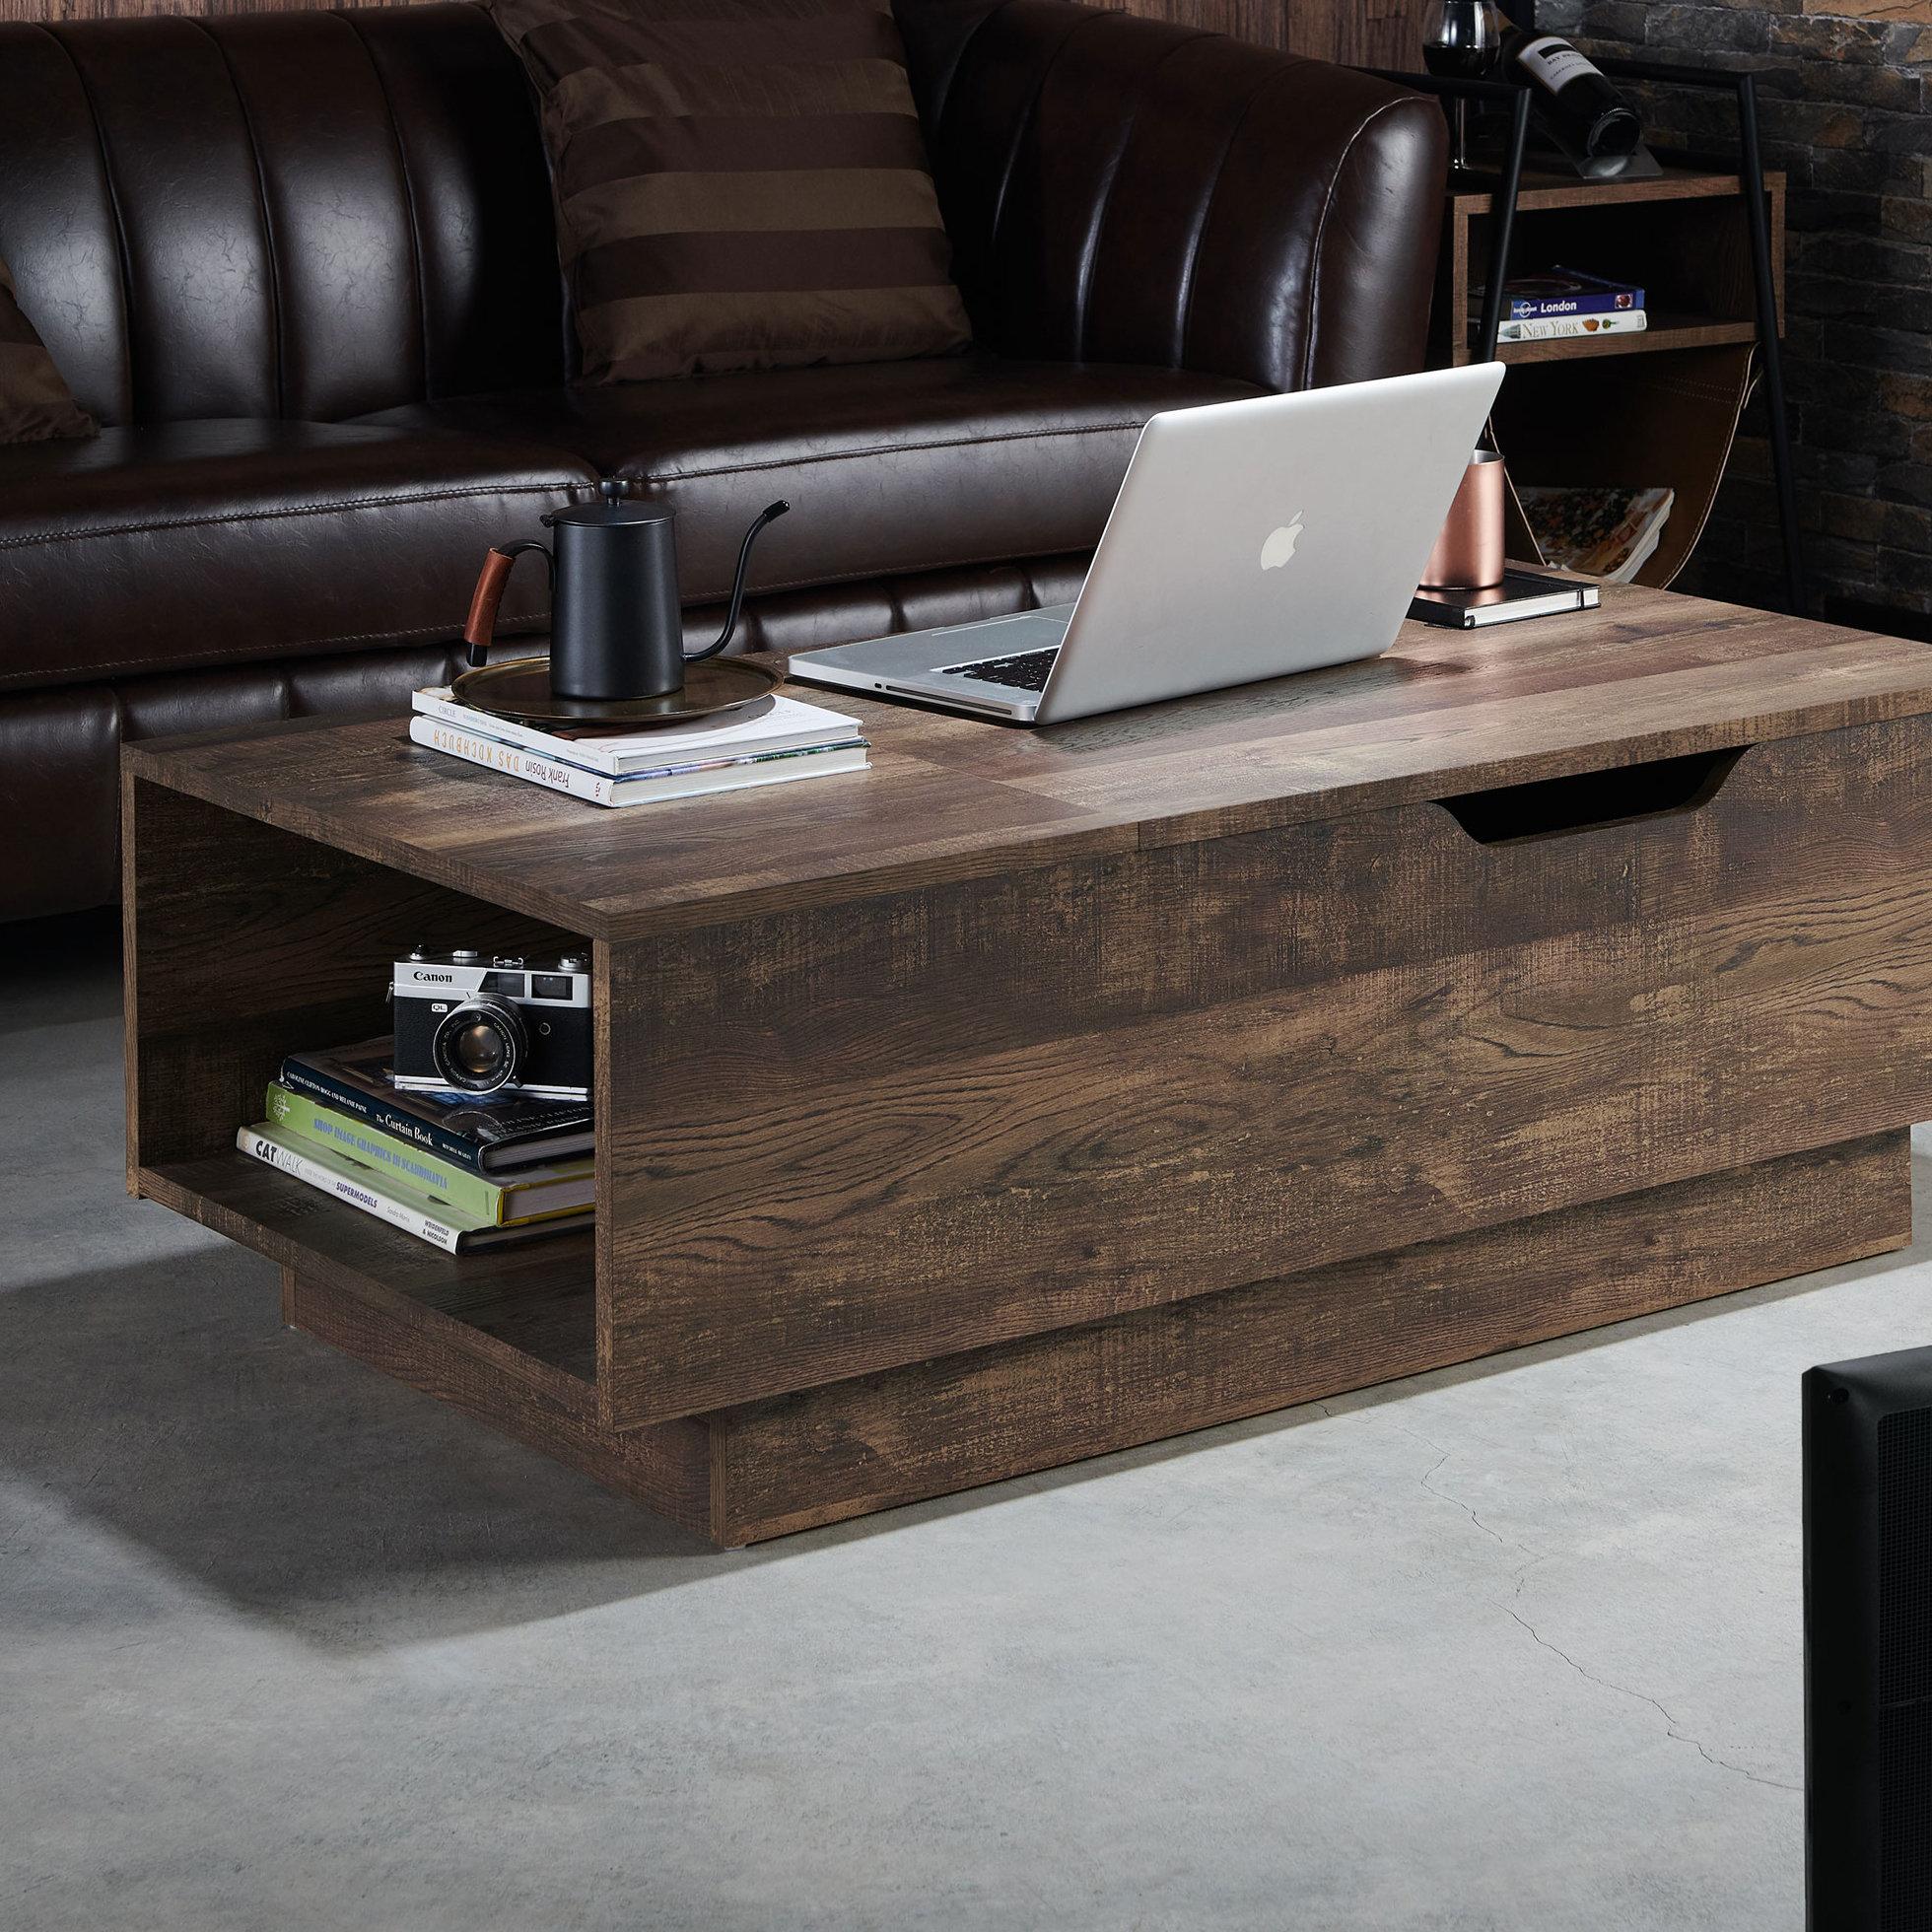 Laurel Foundry Modern Farmhouse Colten Lift Top Block Coffee Table Reviews Wayfair